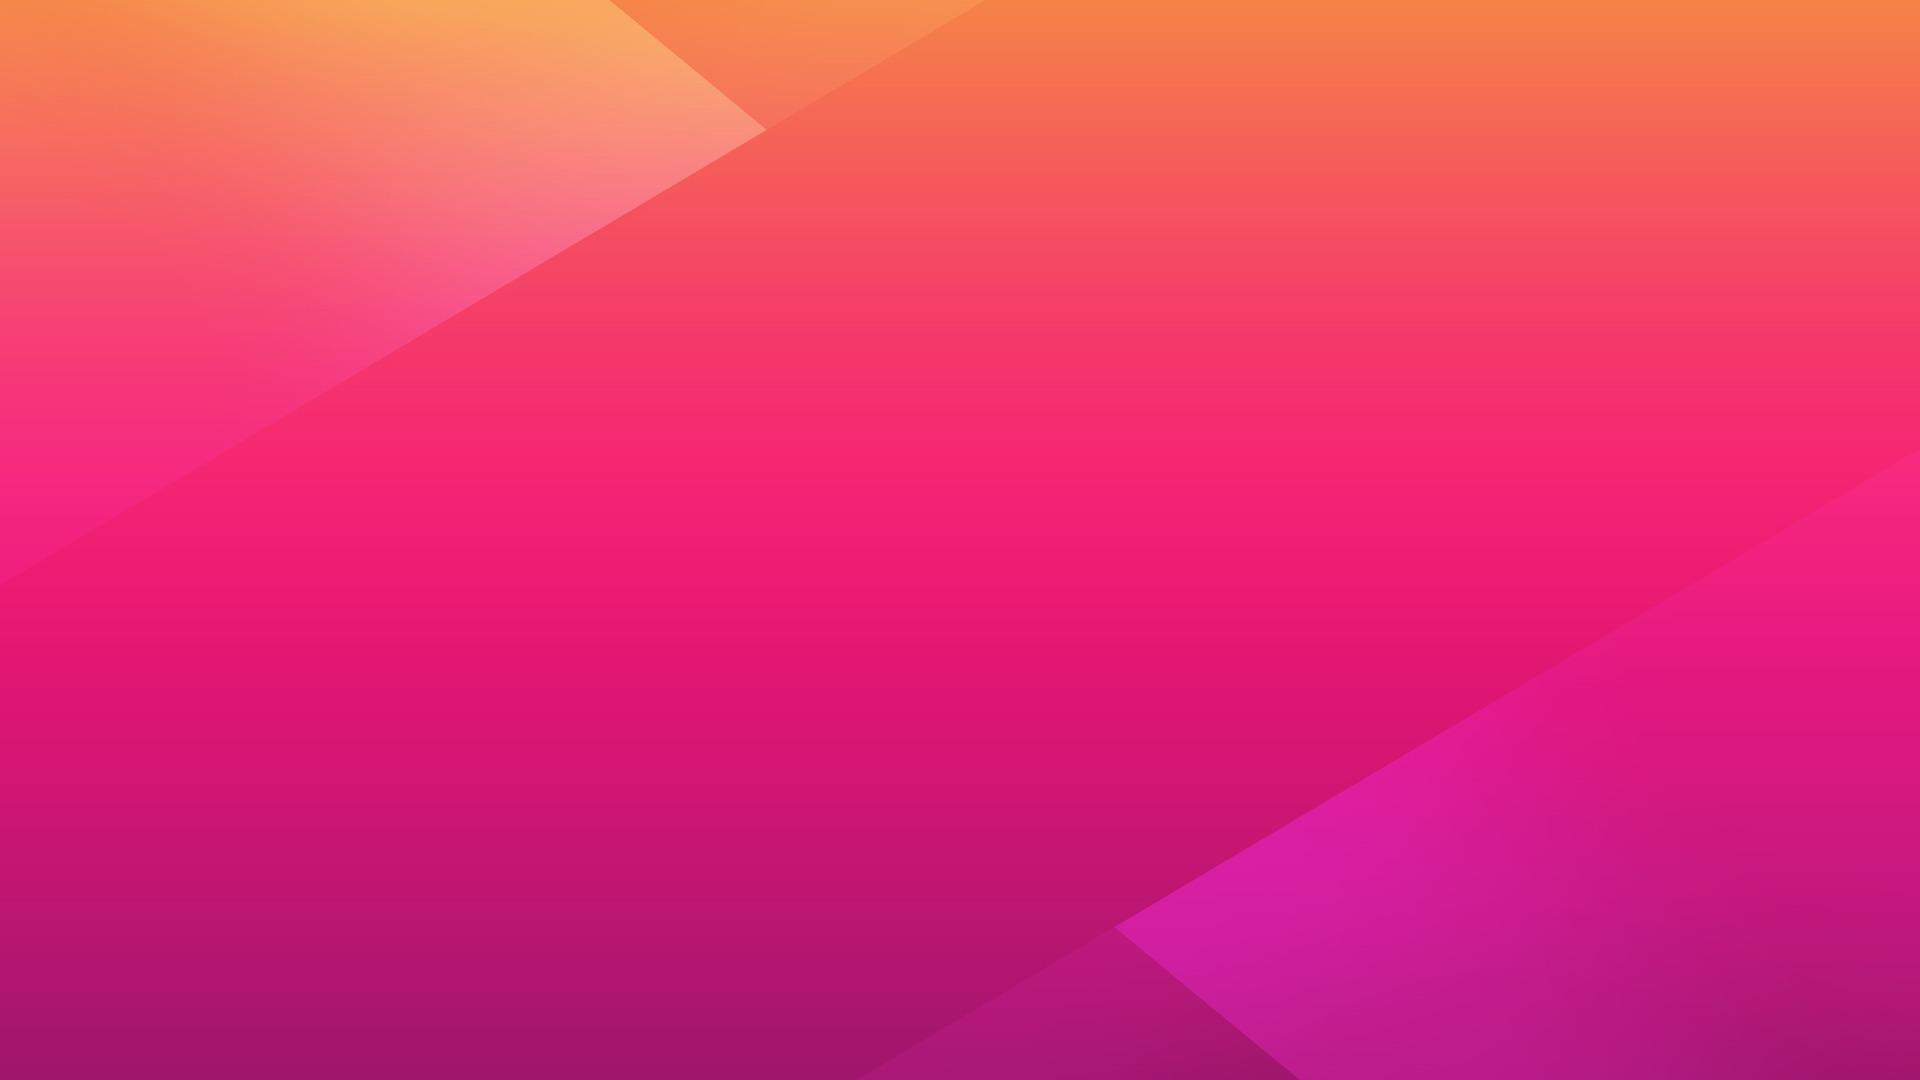 Cute Wallpapers Drawing Hd Gradient Backgrounds Pixelstalk Net